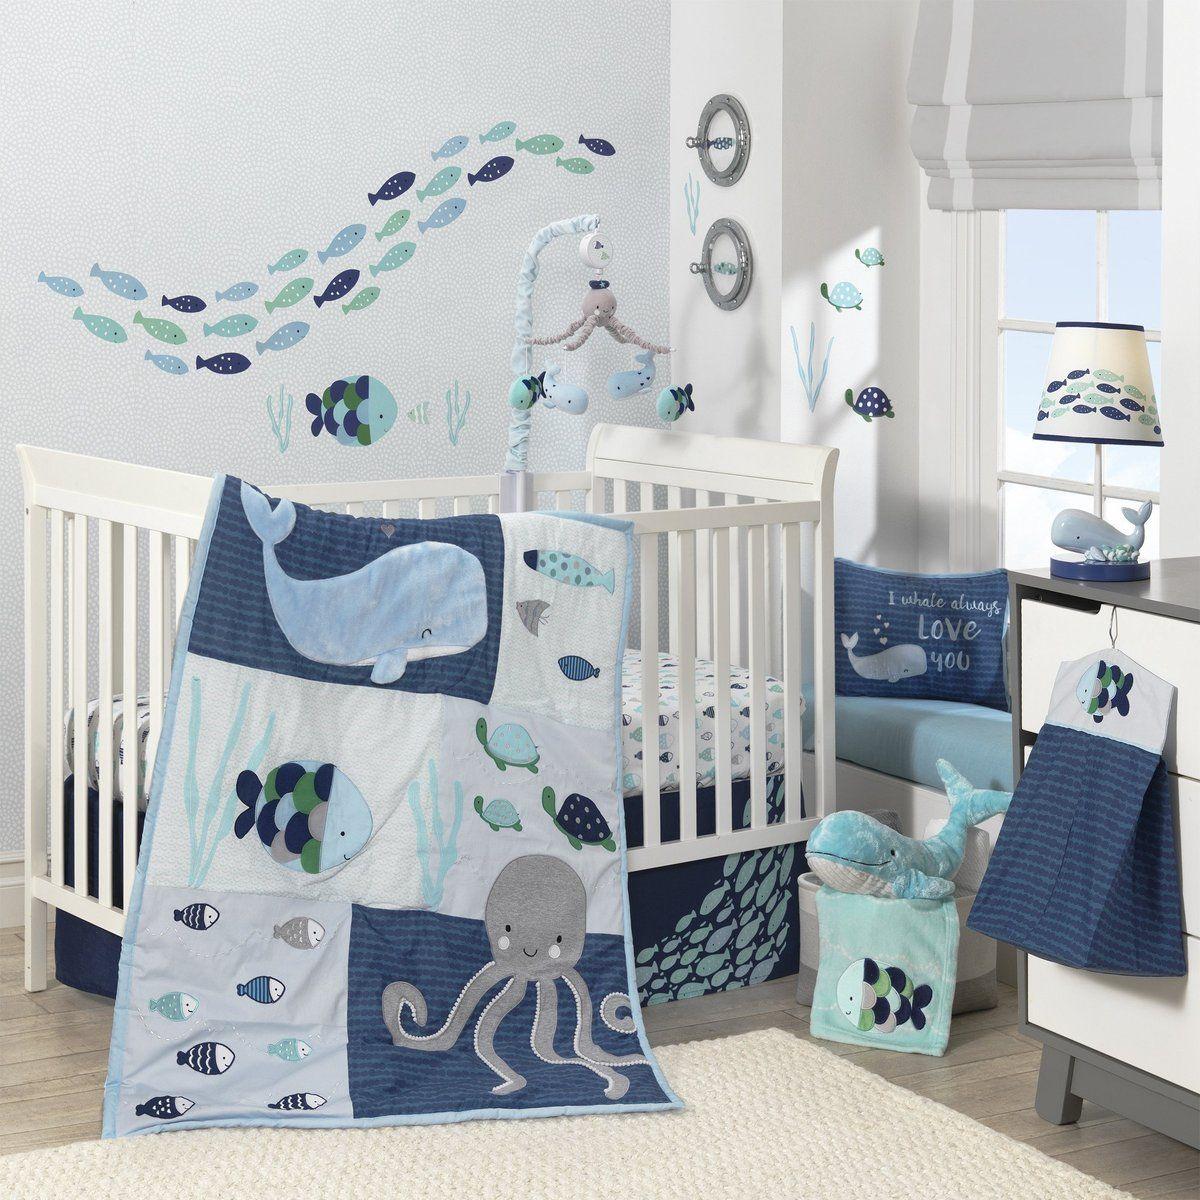 Oceania 6 Piece Crib Bedding Set In 2021 Baby Bedding Sets Baby Crib Bedding Sets Baby Crib Bedding